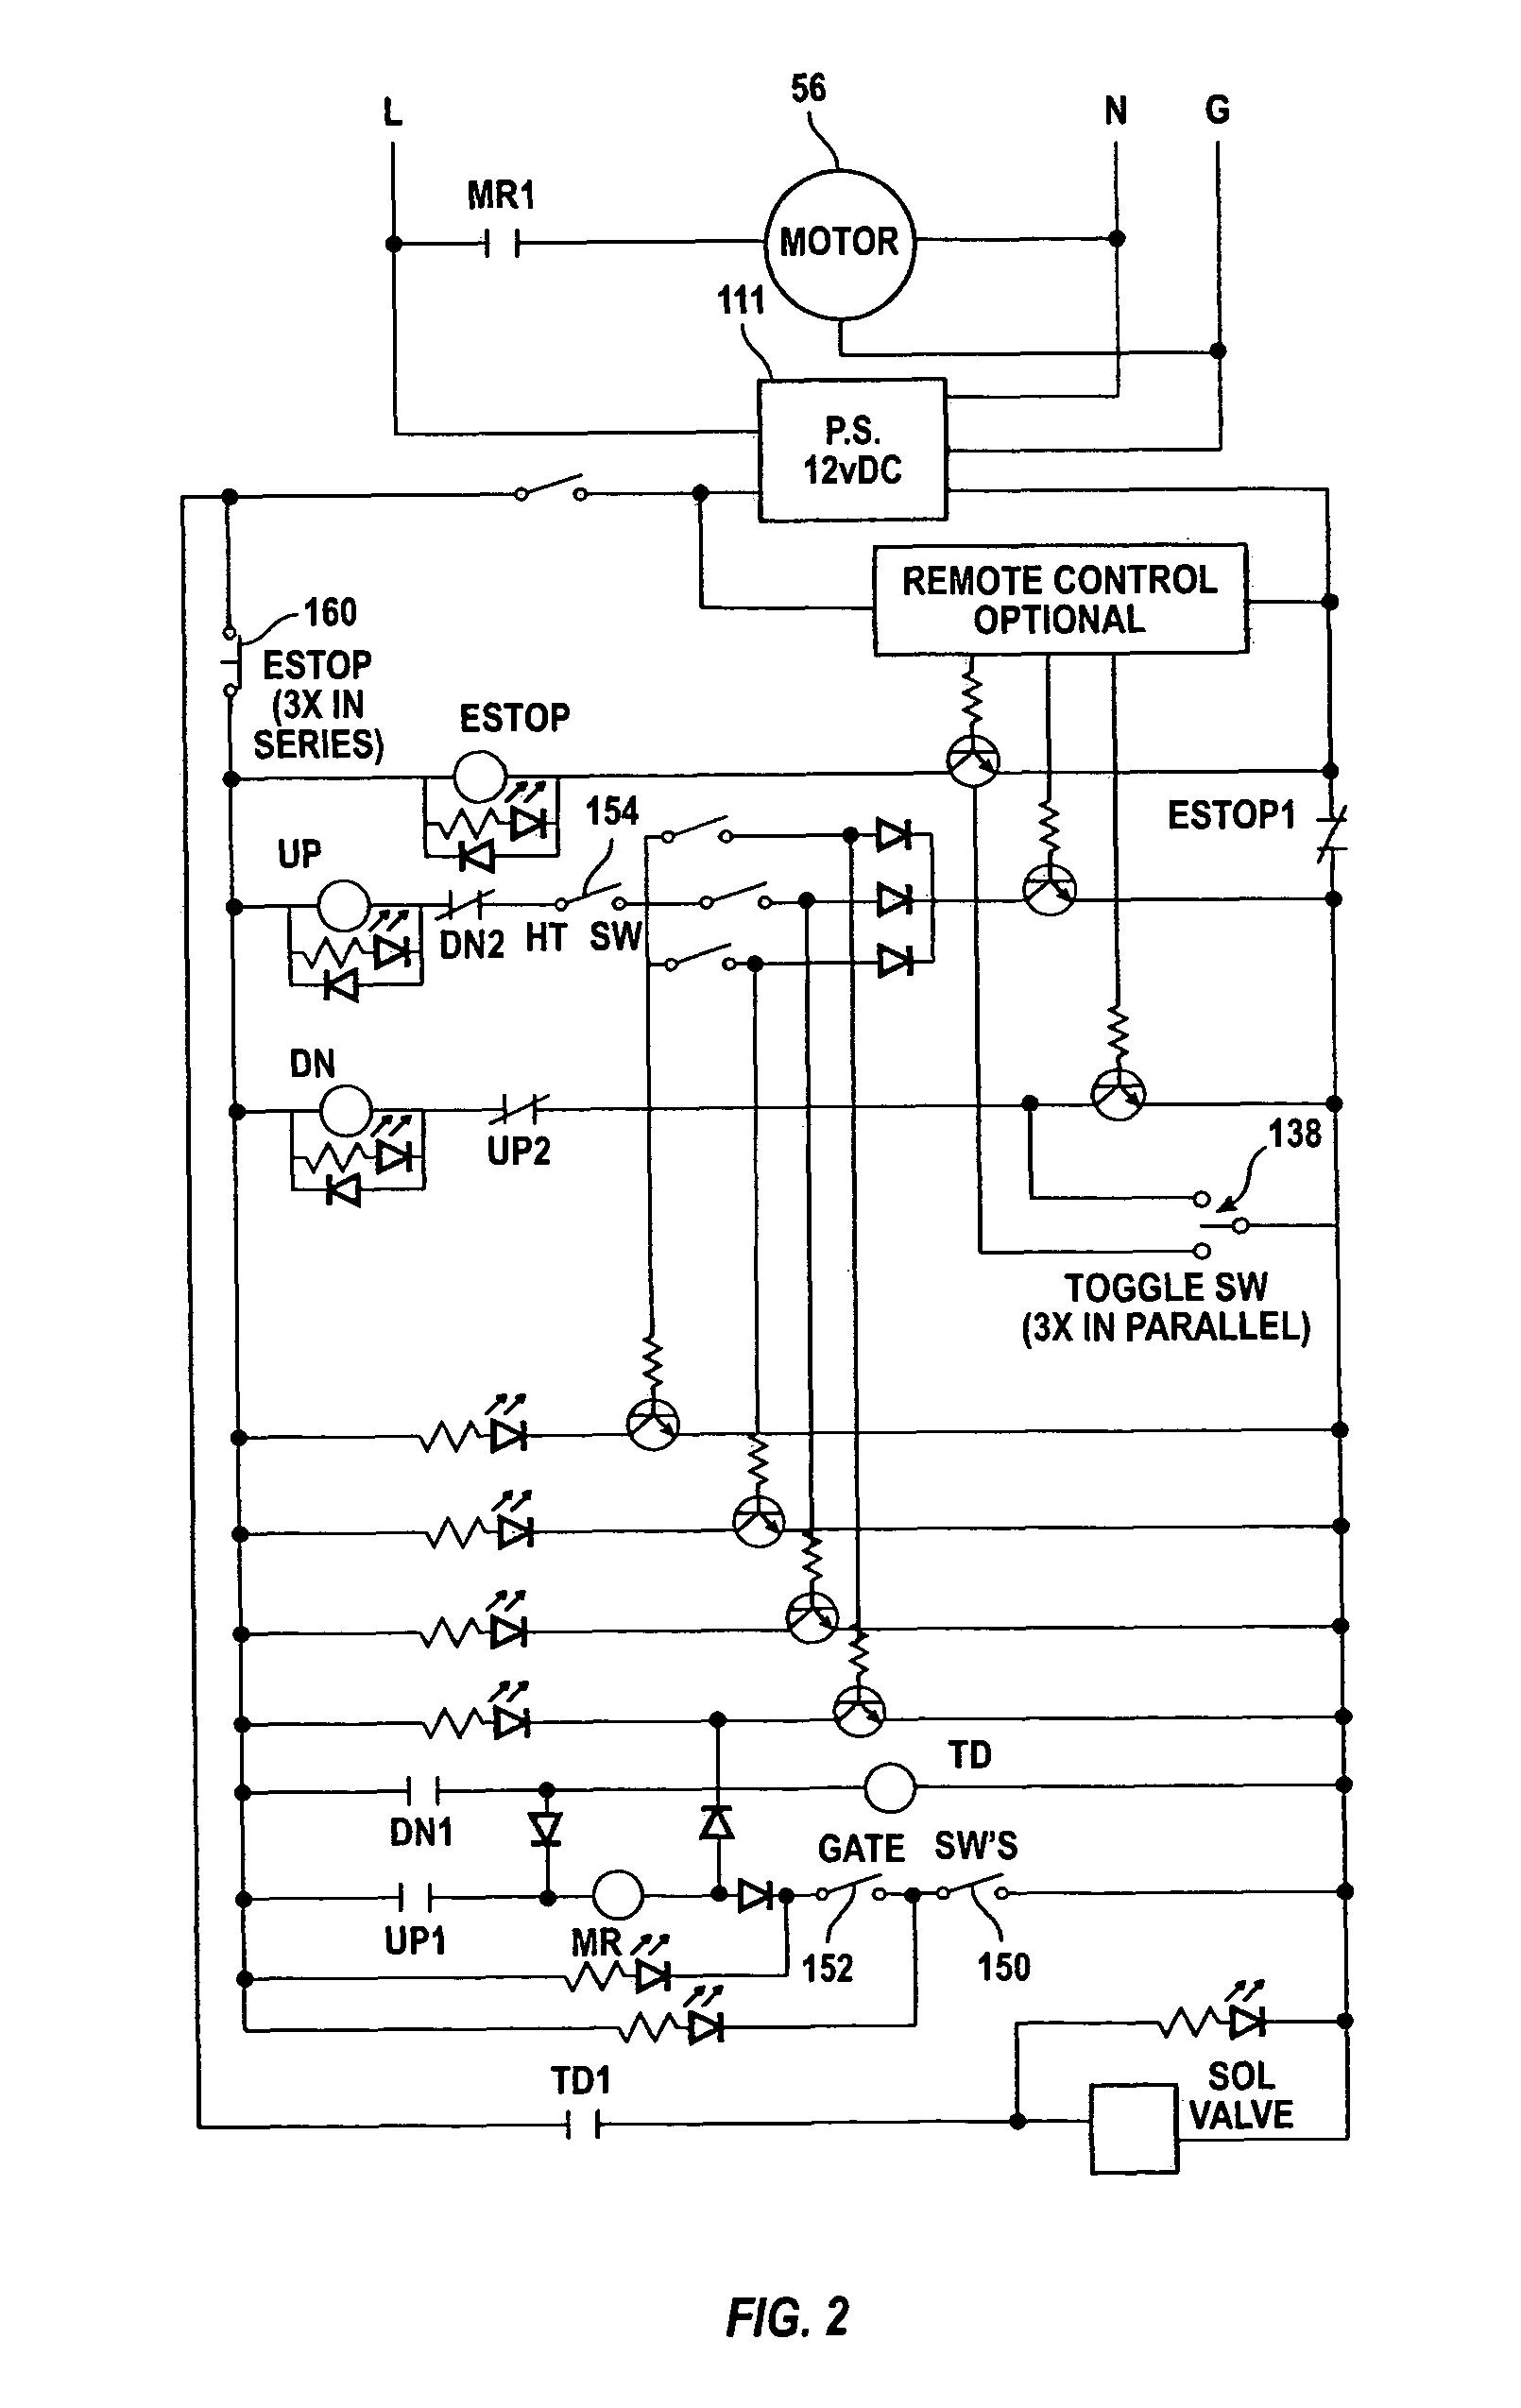 Volvo Construction Motor diagram